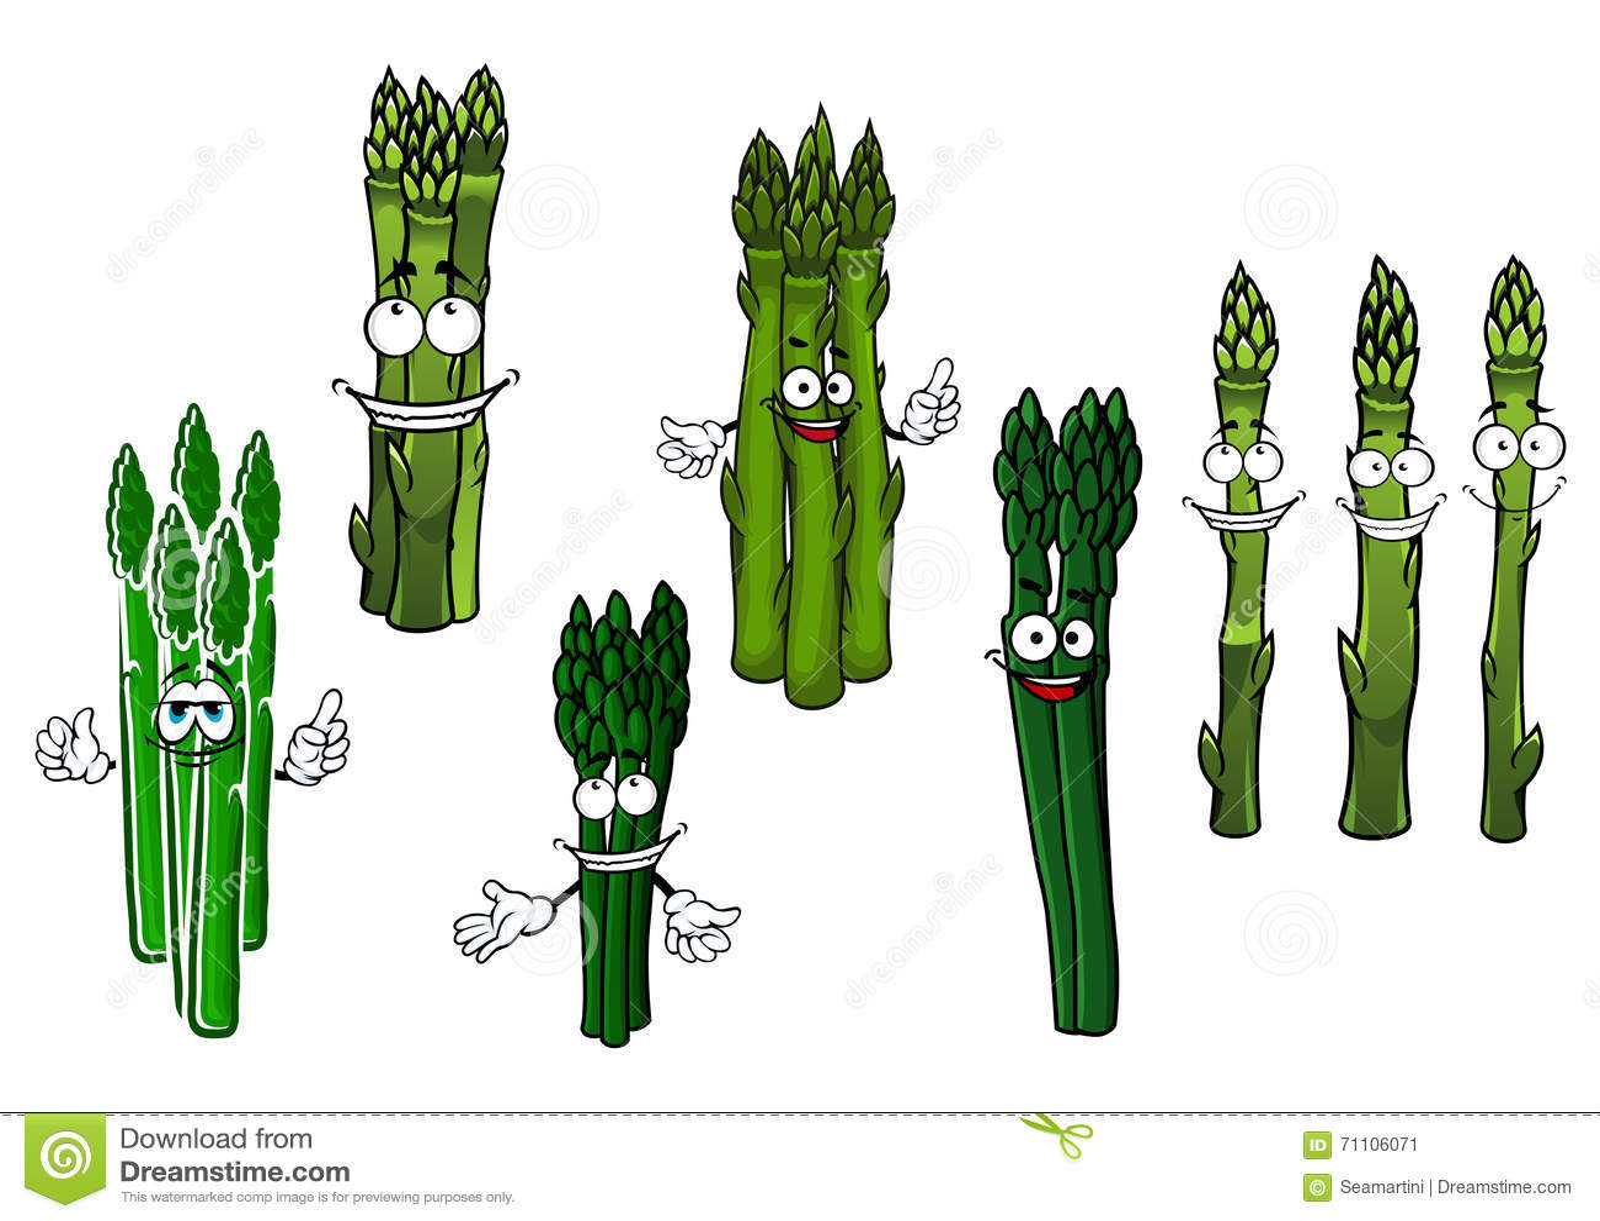 Cartoon Bundles Of Green Asparagus Vegetables Stock Vector